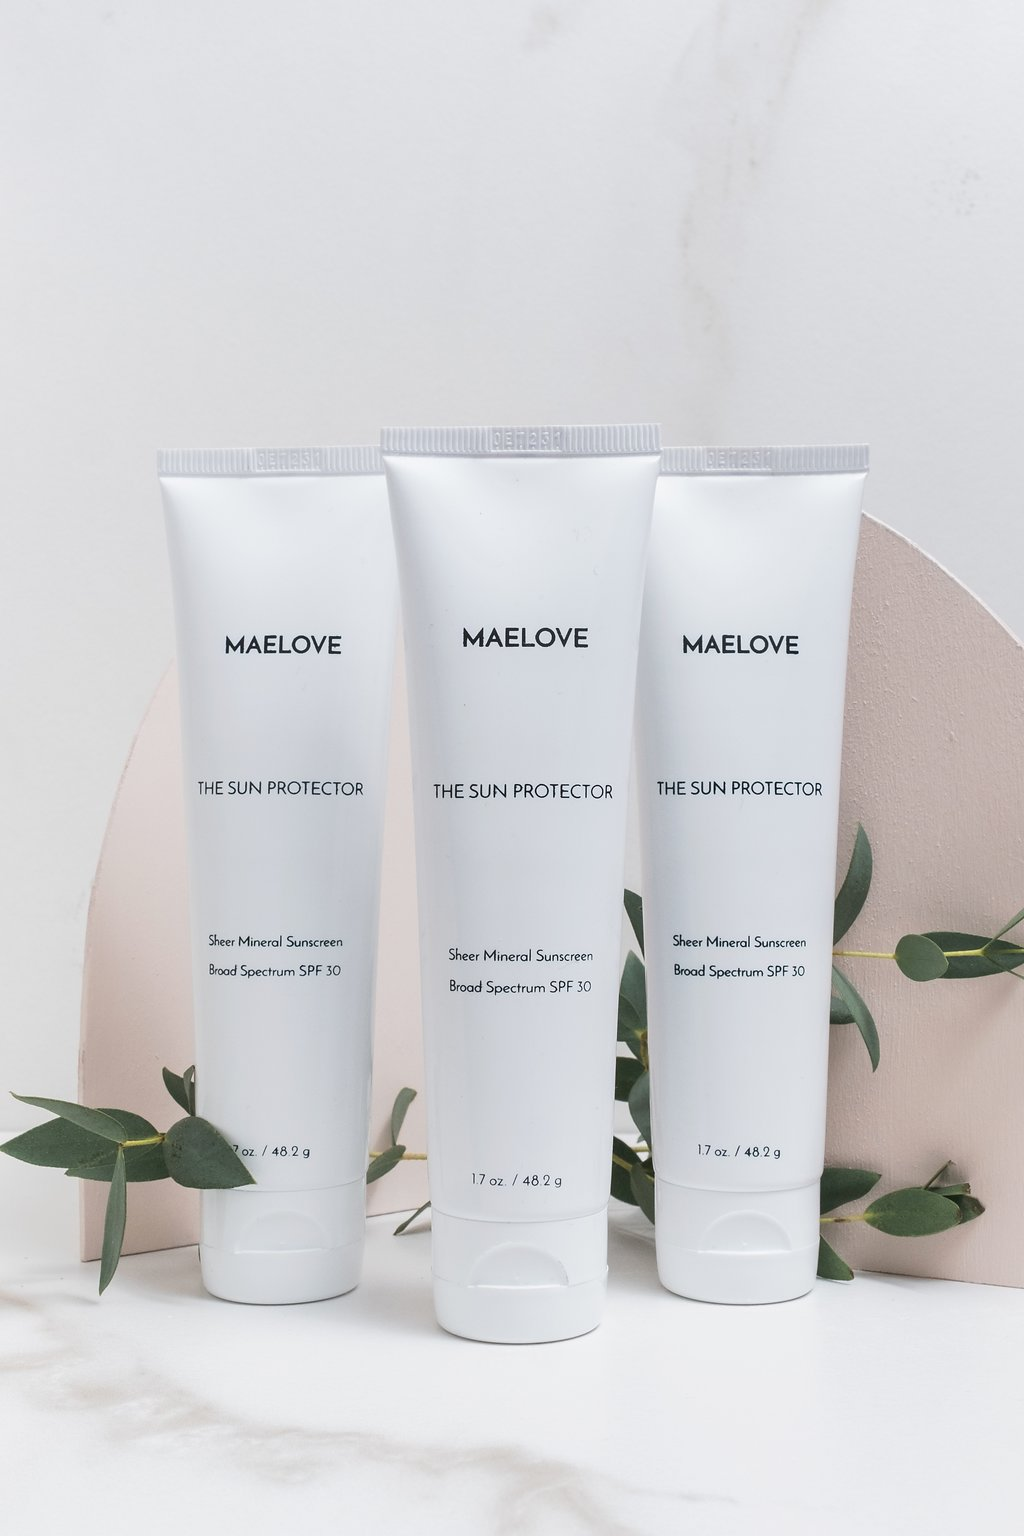 Maelove